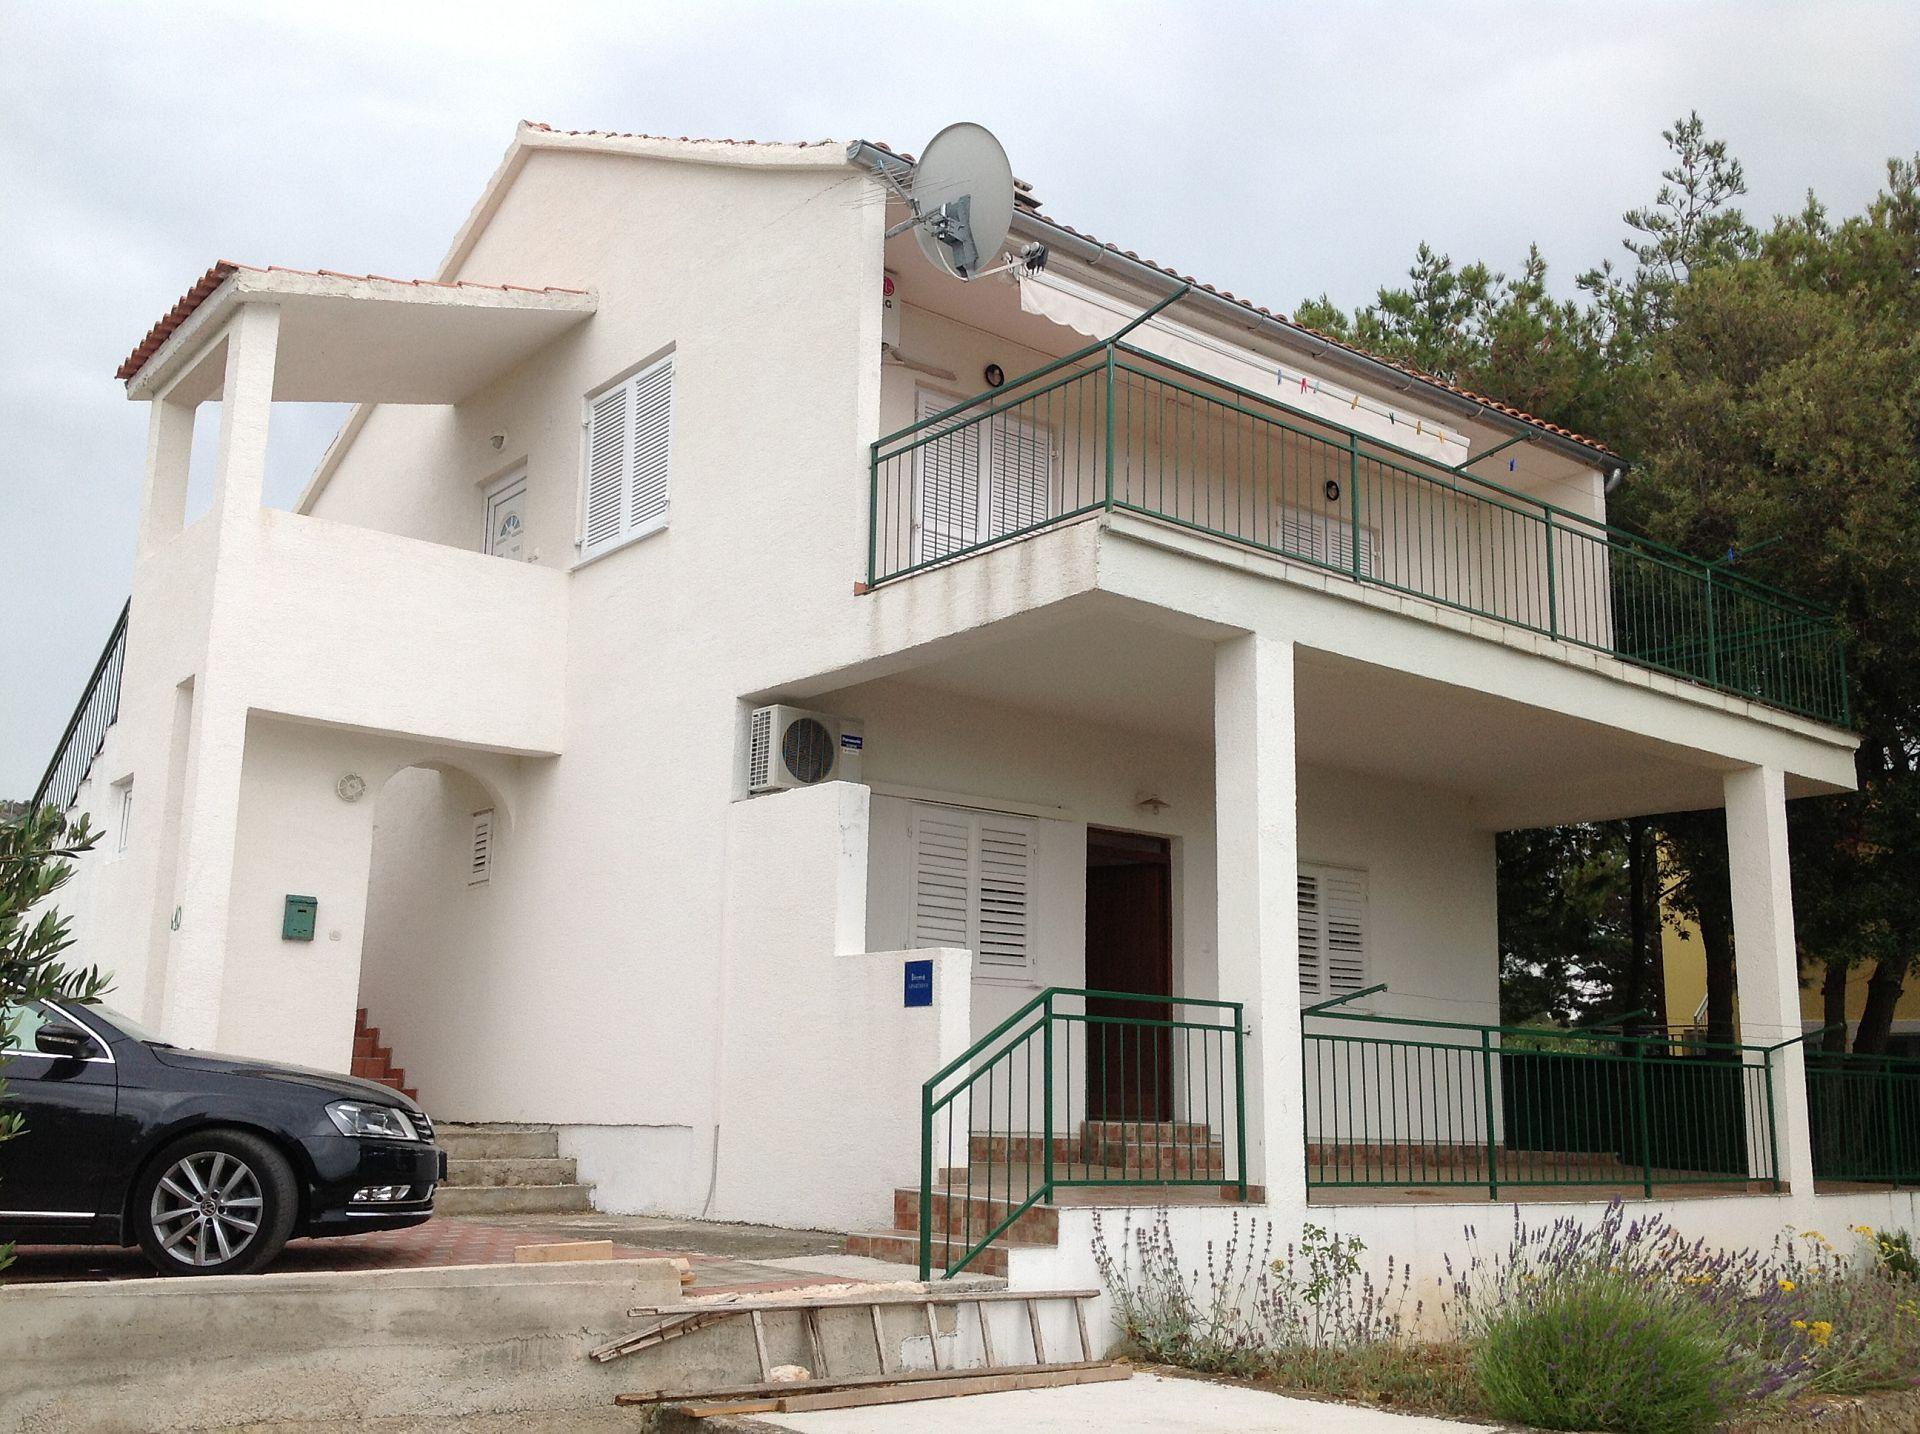 Apartmani Apartment Di A2 gornji Primosten, Riviera Sibenik 51371, Primošten, , Šibensko-kninska županija